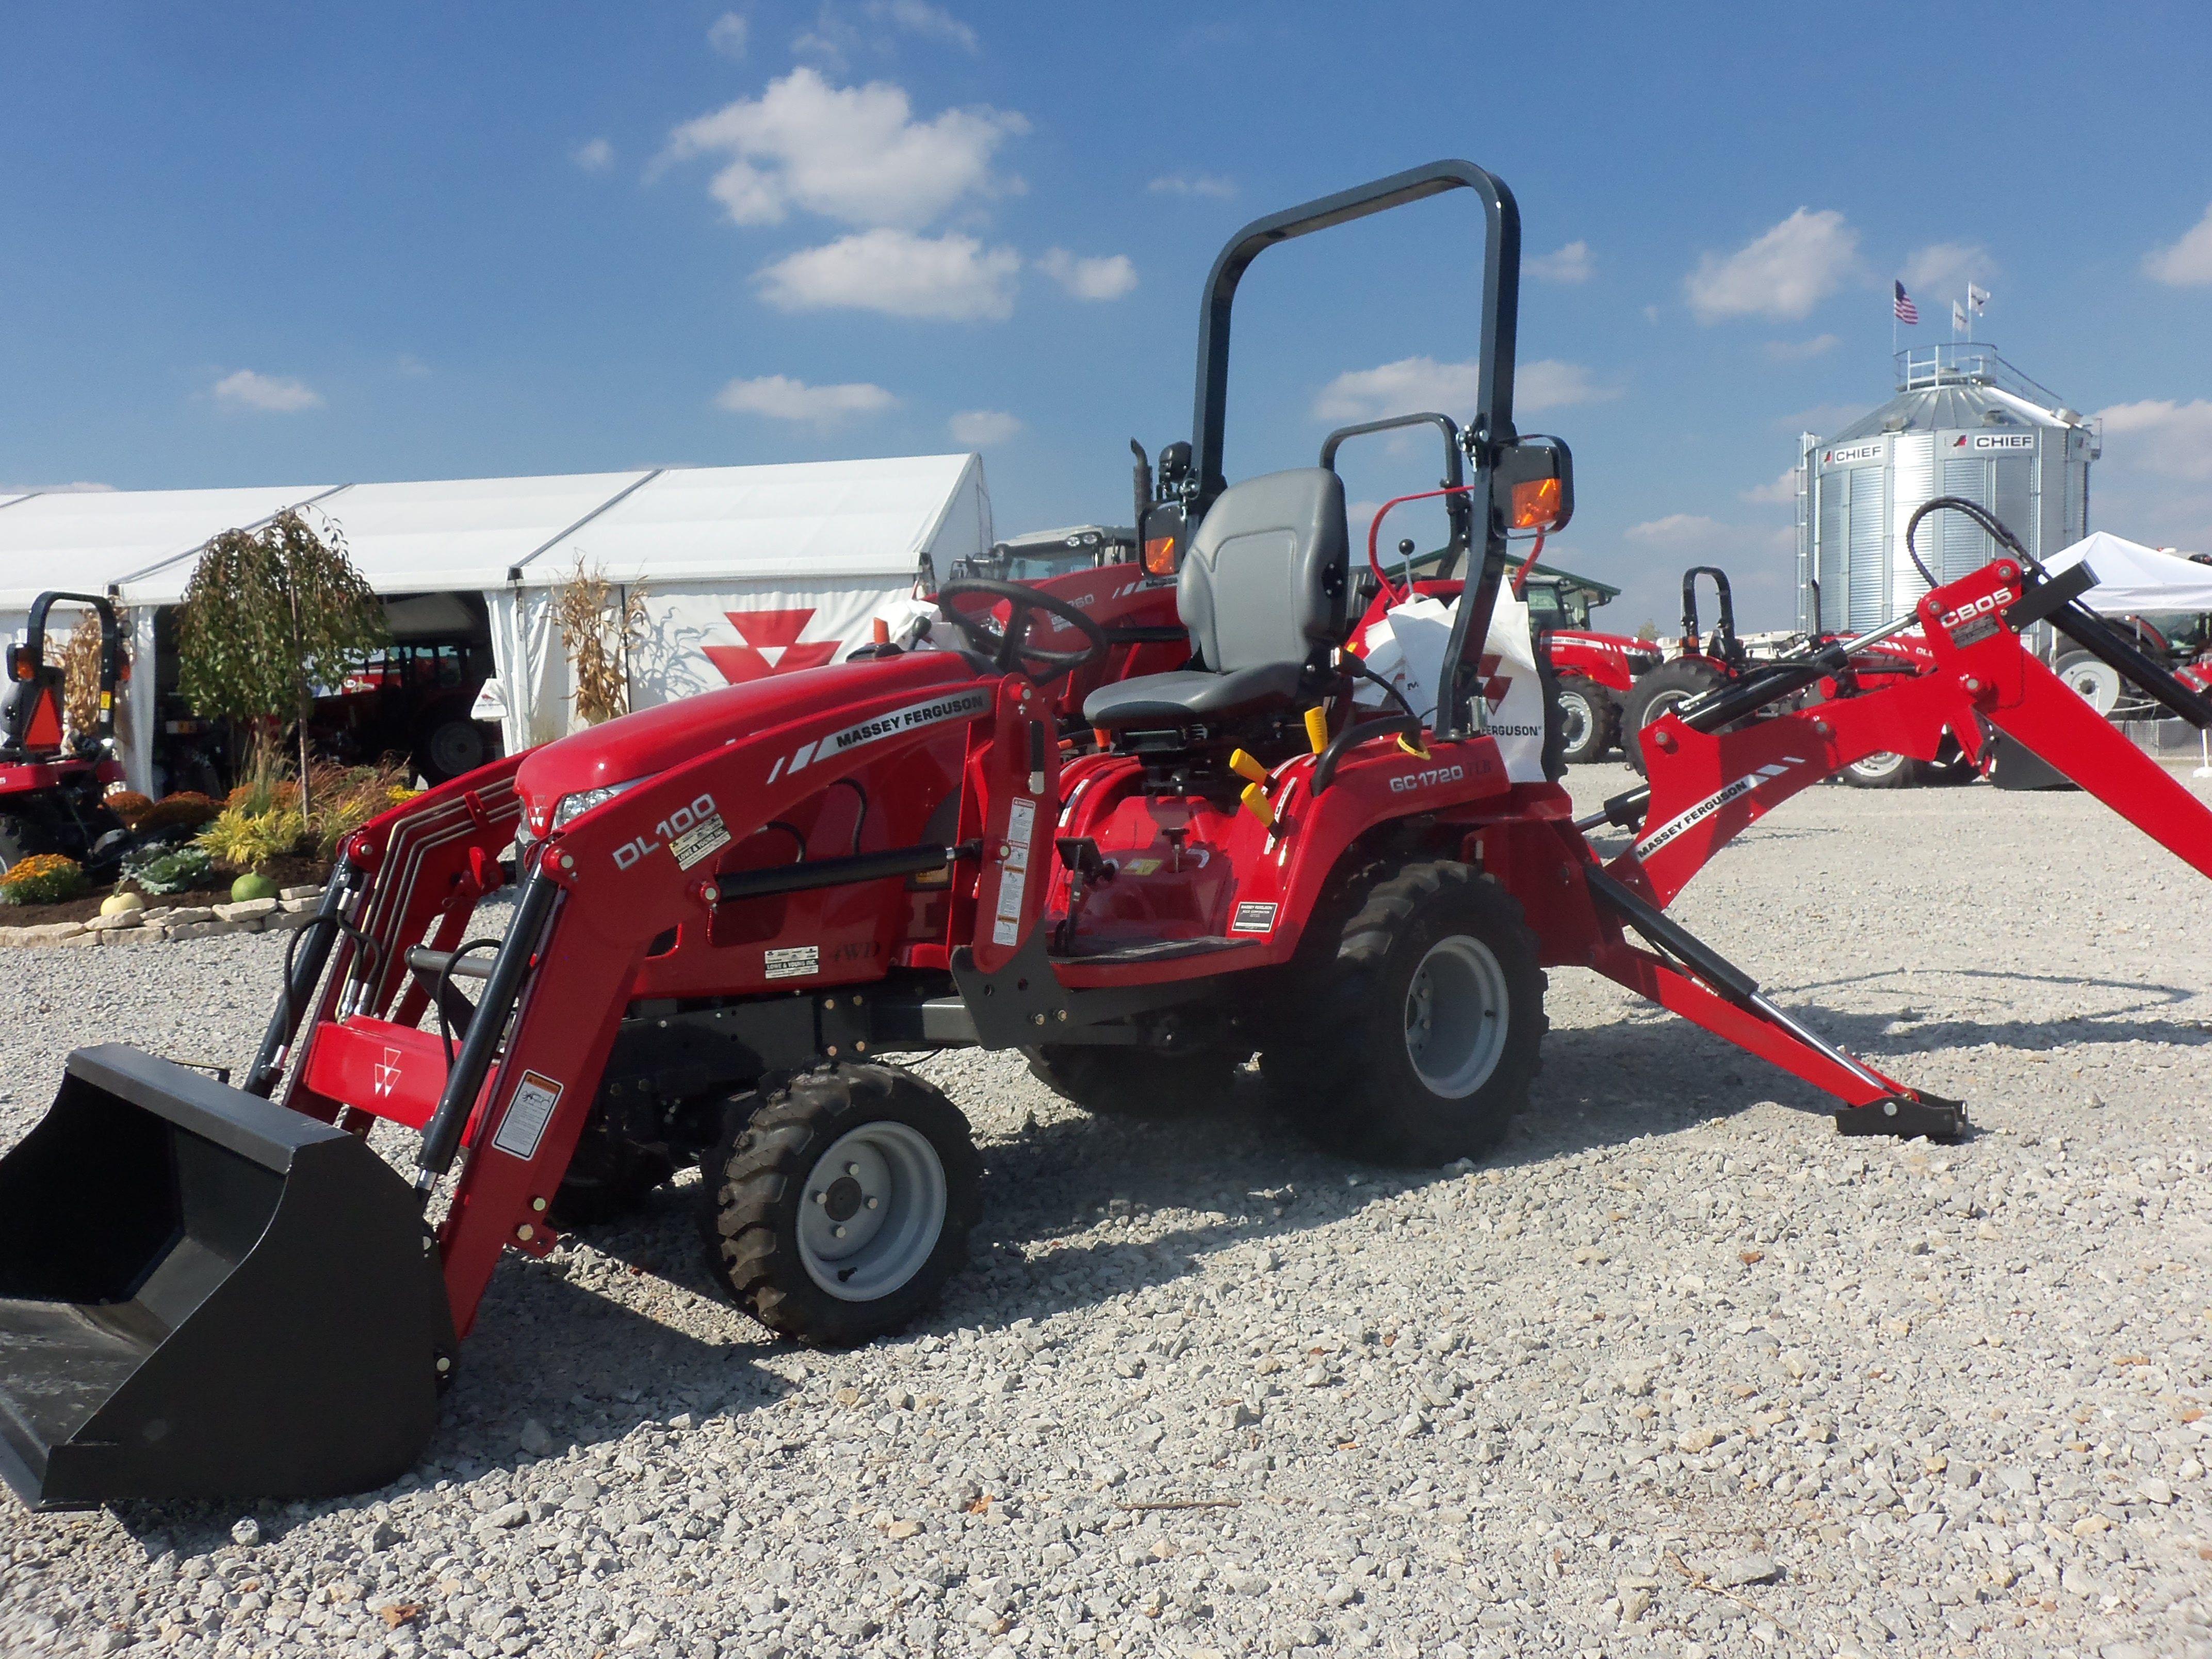 Massey Ferguson Tractor Loader Backhoe : Massey ferguson gc tractor loader backhoe